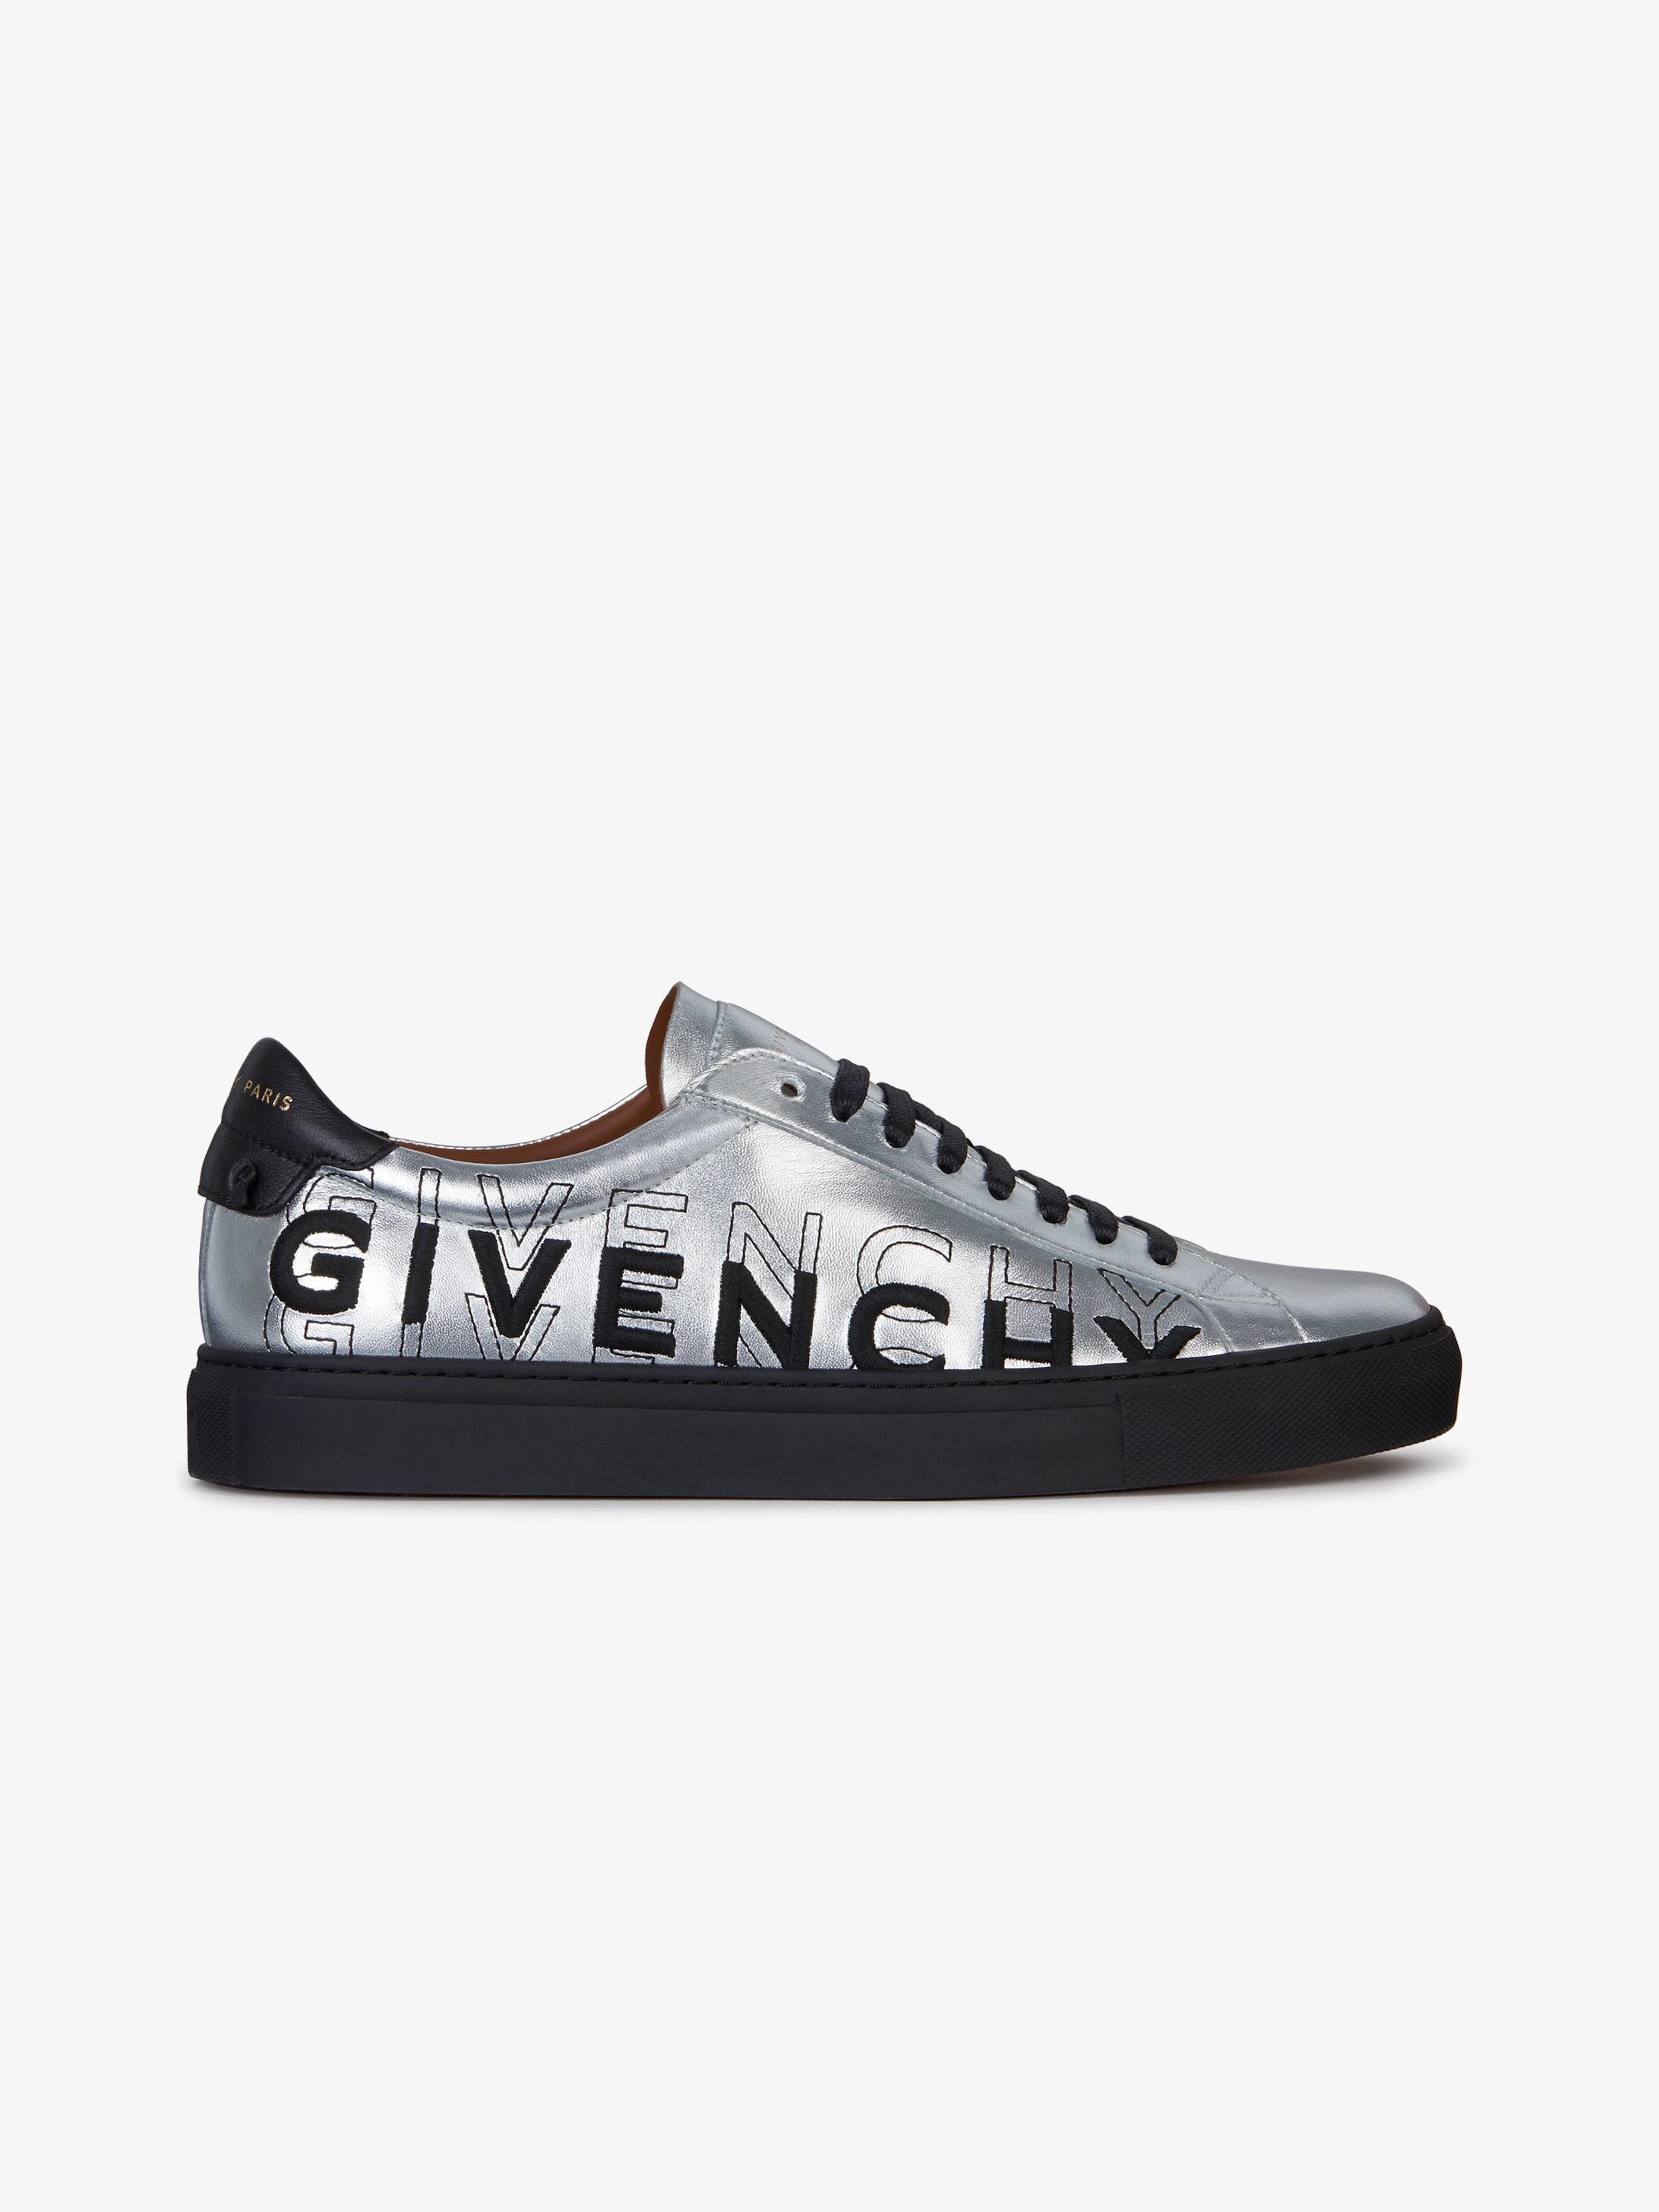 Sneakers en cuir métallisé GIVENCHY dégradé